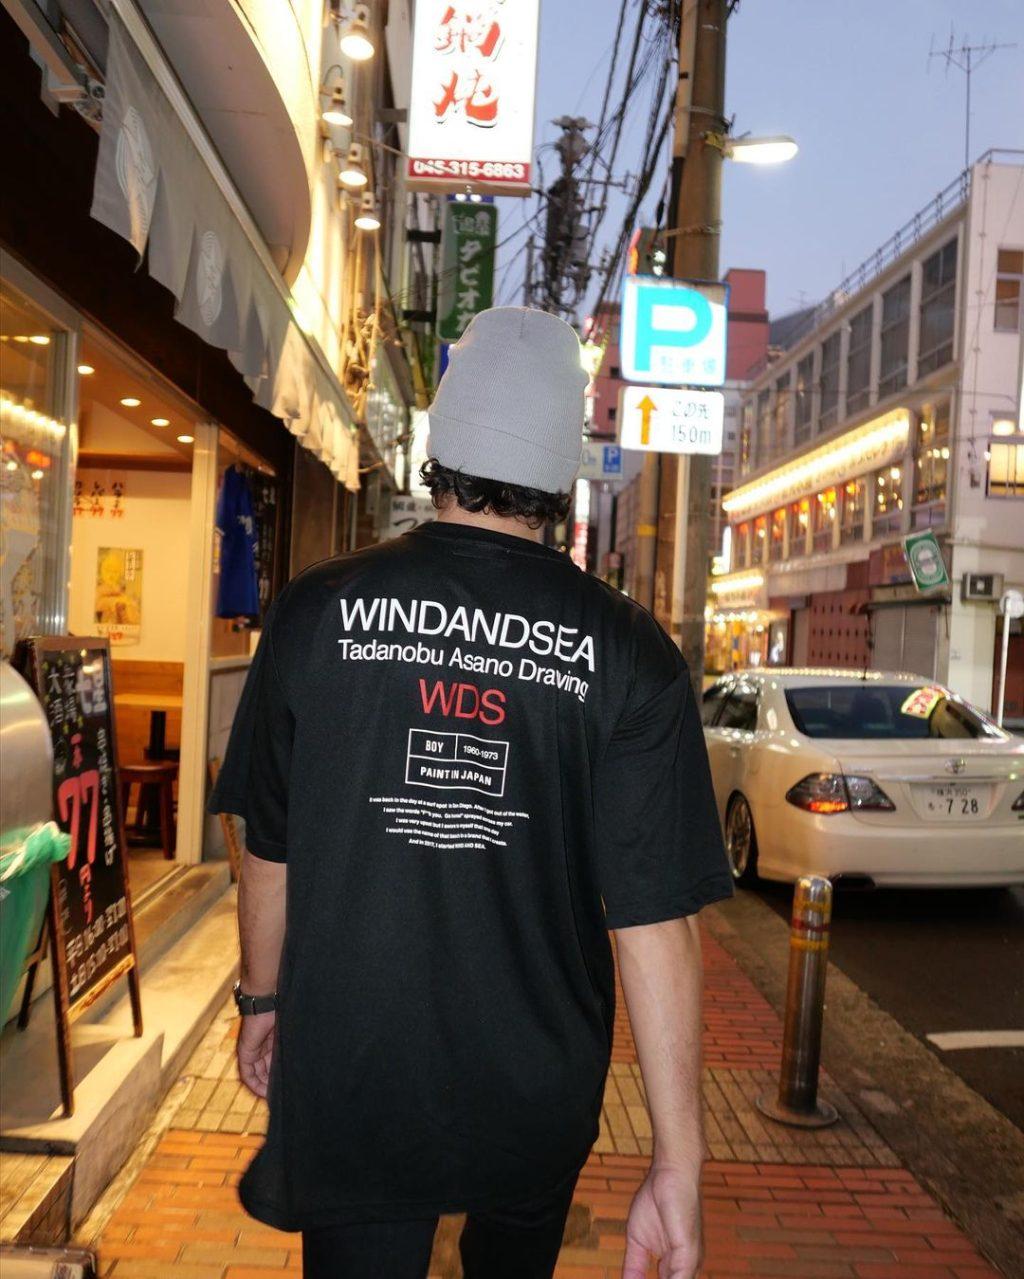 tadanobu-asano-wind-and-sea-collaboration-20201107